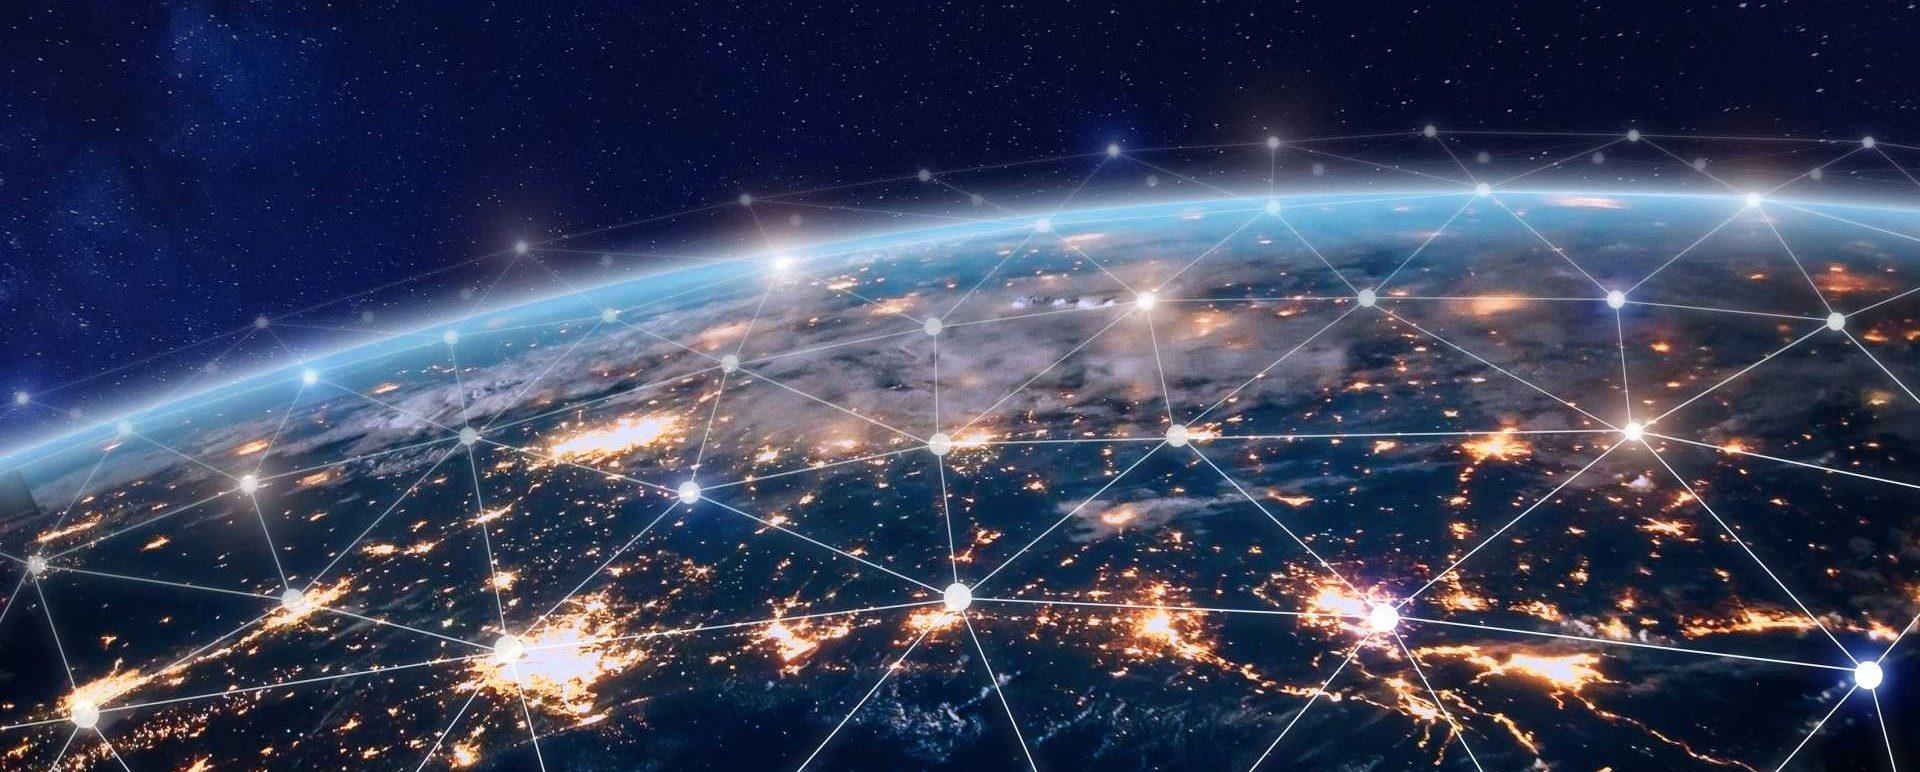 Supply chain logistics world globe network - shutterstock_725917057